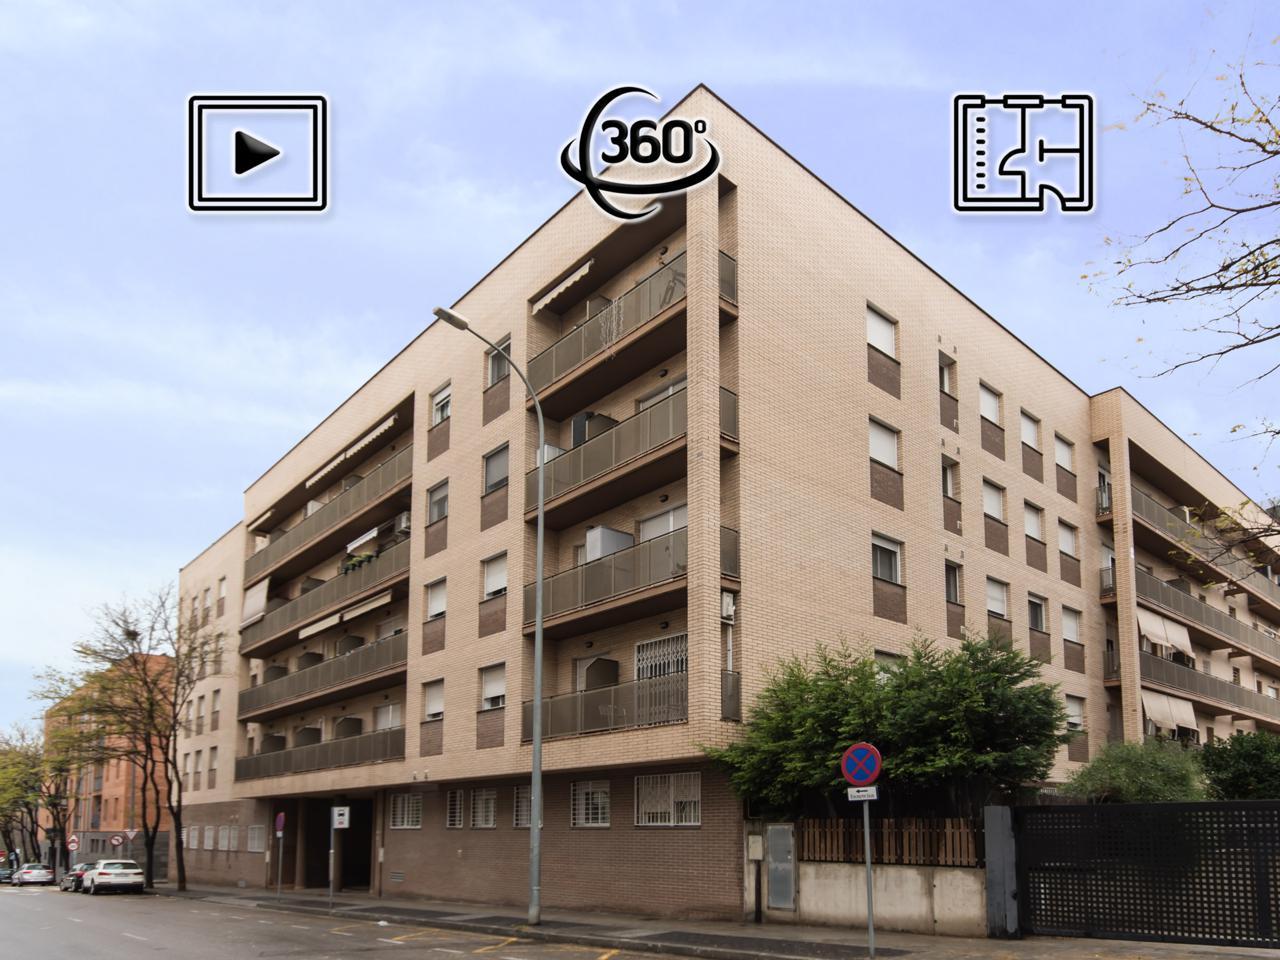 piso en montcada-i-reixac · carrer-joan-miro-9-08110 222705€